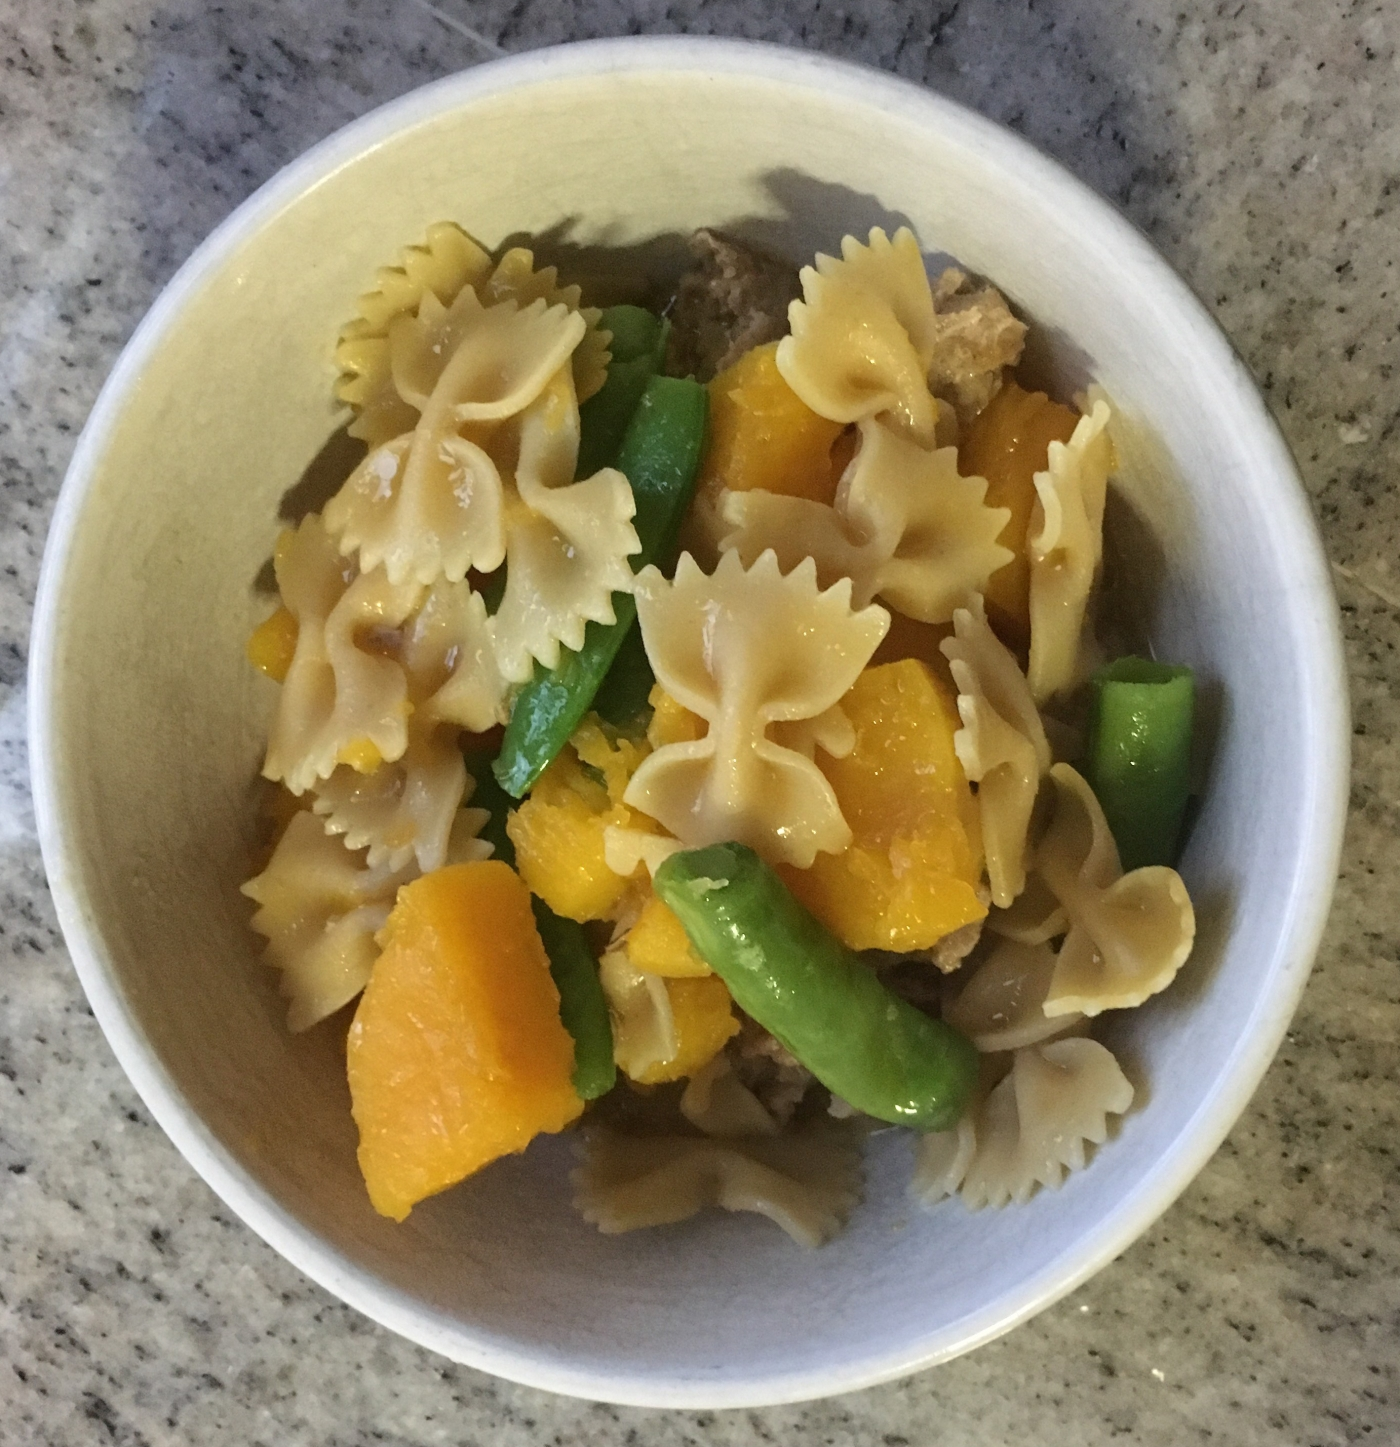 Simple weeknight pasta, butternut squash, pea & sausage 'soup'